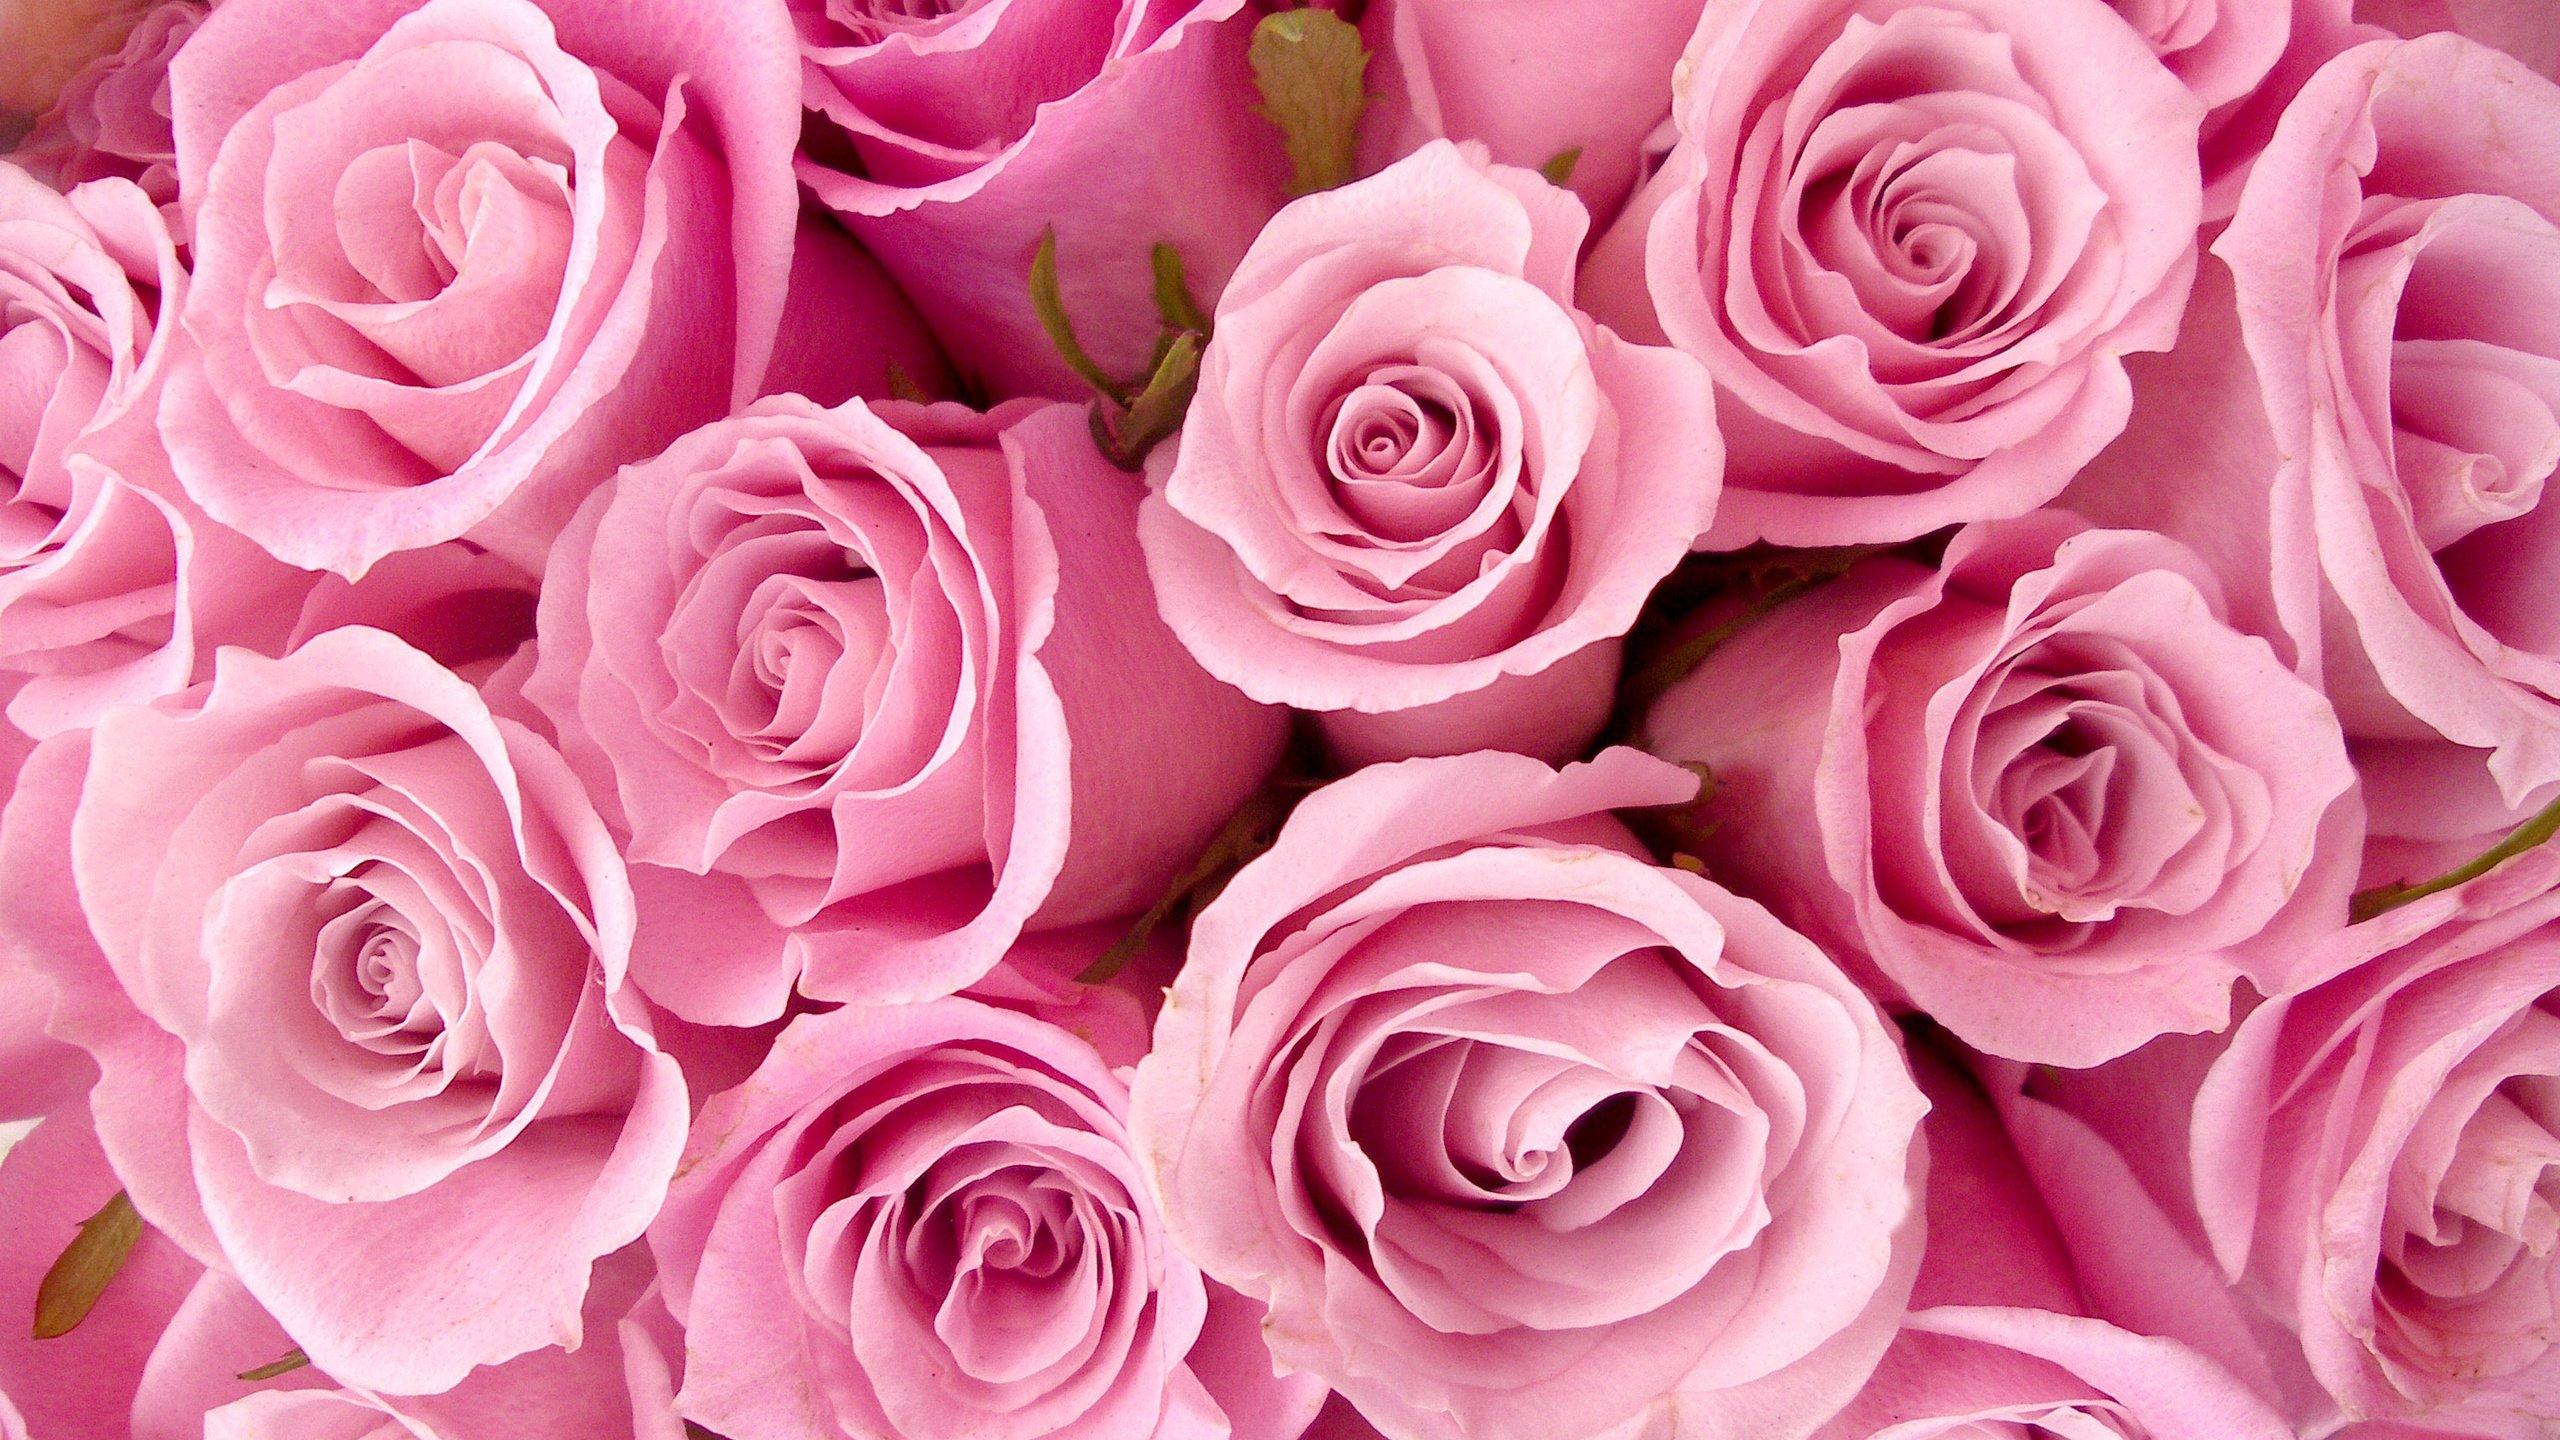 картинка на телефон розовые розы холме парка лога